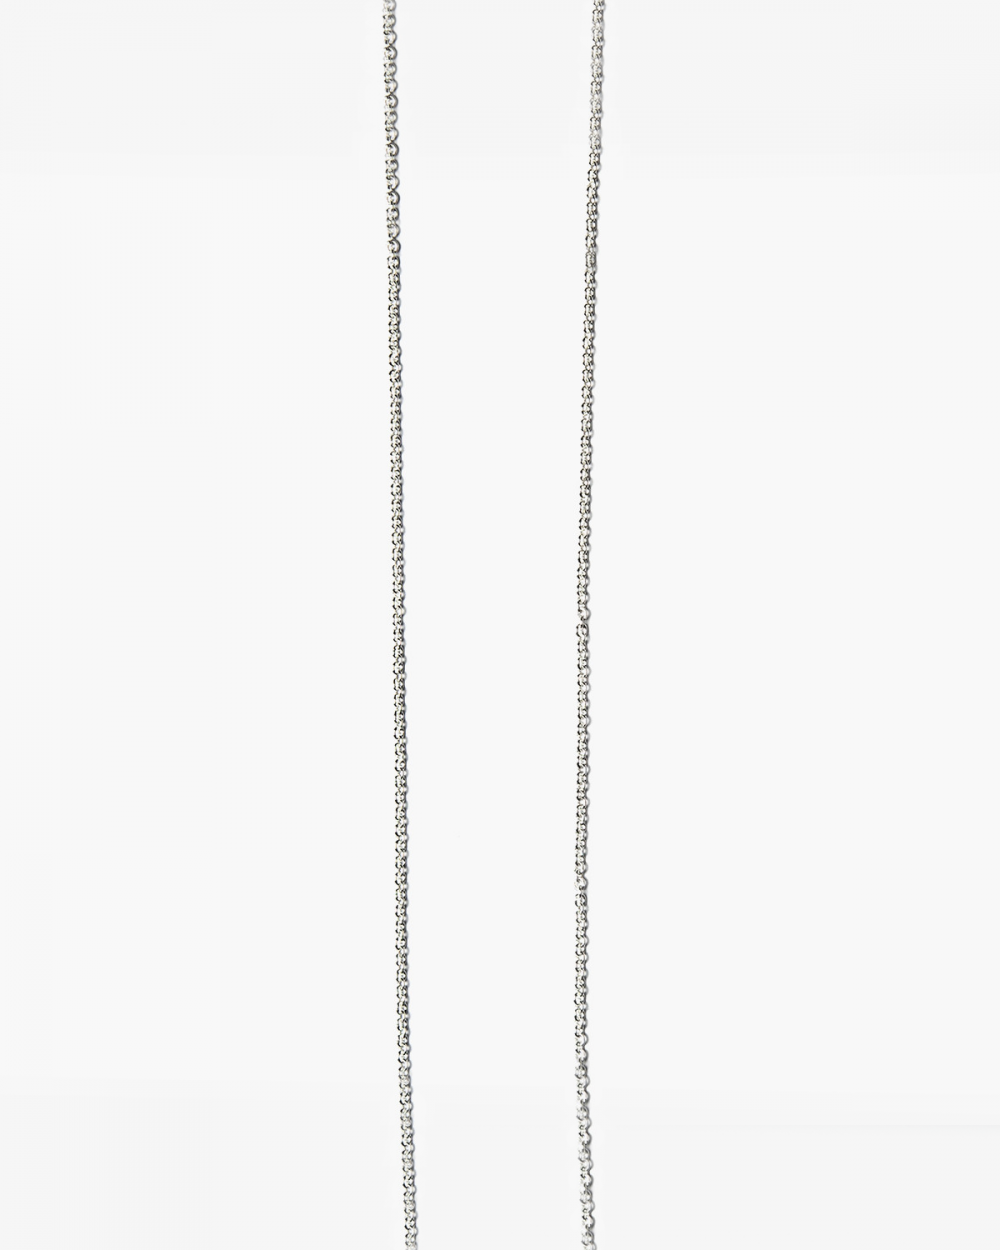 Necklaces CABLE CHAIN 040 NOVE25